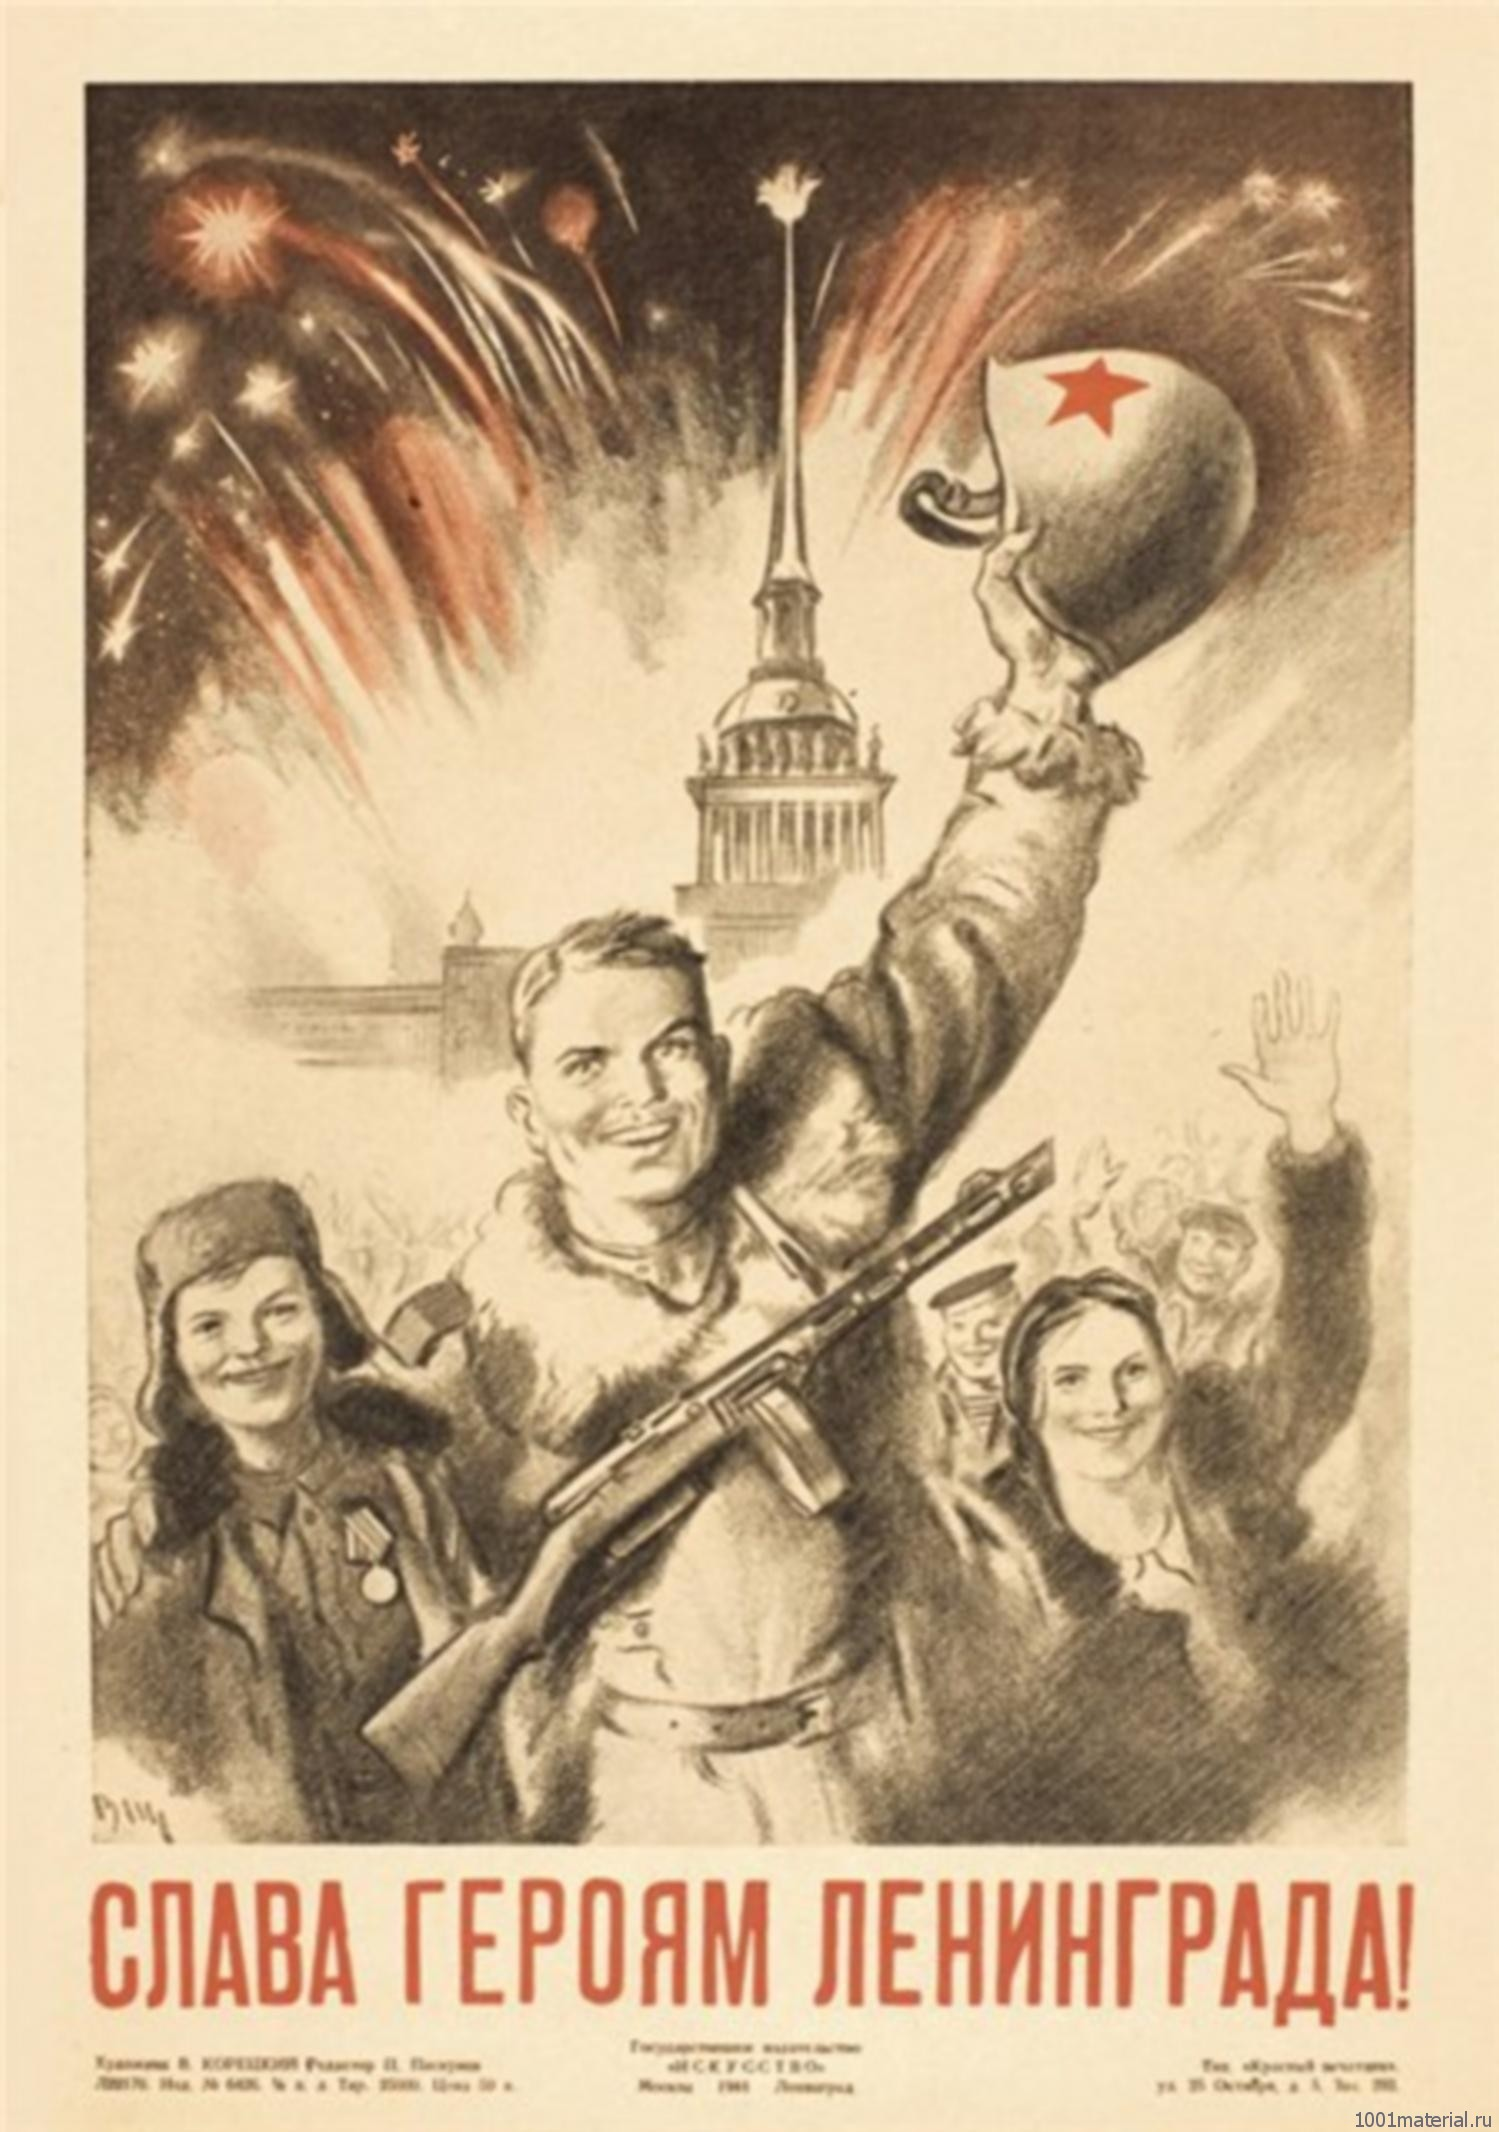 Слава героям Ленинграда!